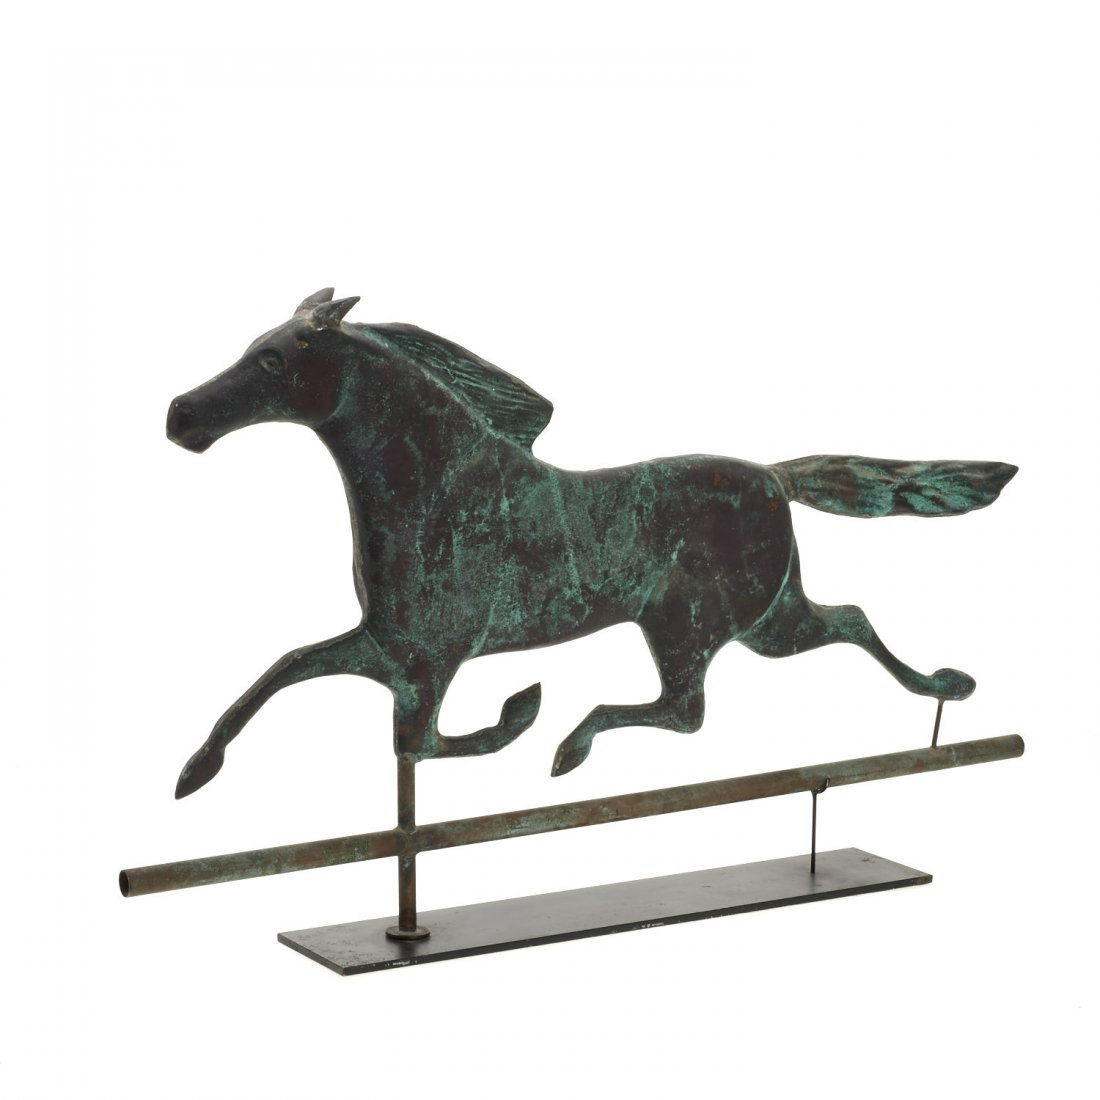 Antique American copper running horse weathervane